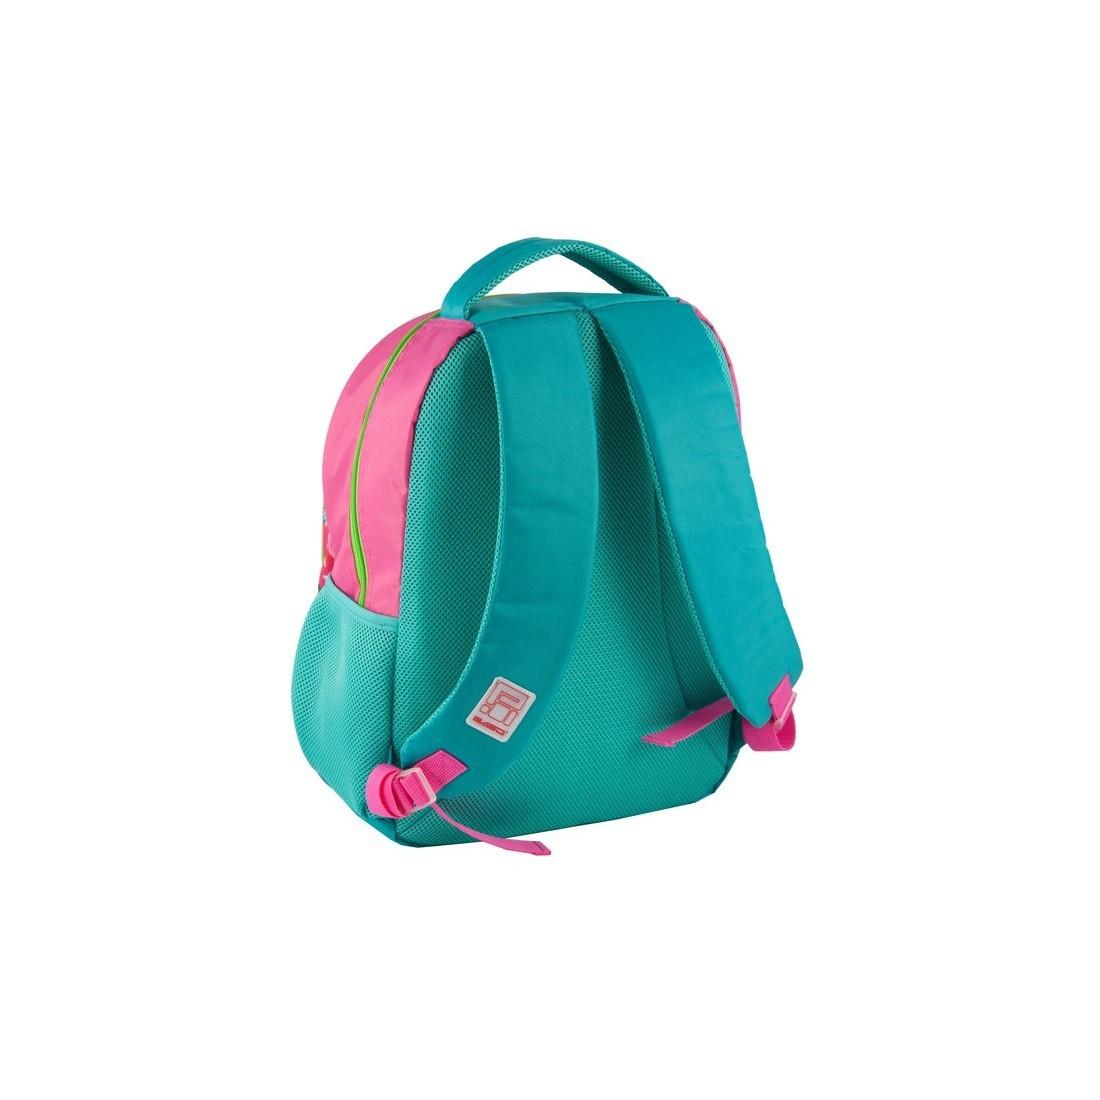 Plecak szkolny Winx Fairy Couture - plecak-tornister.pl